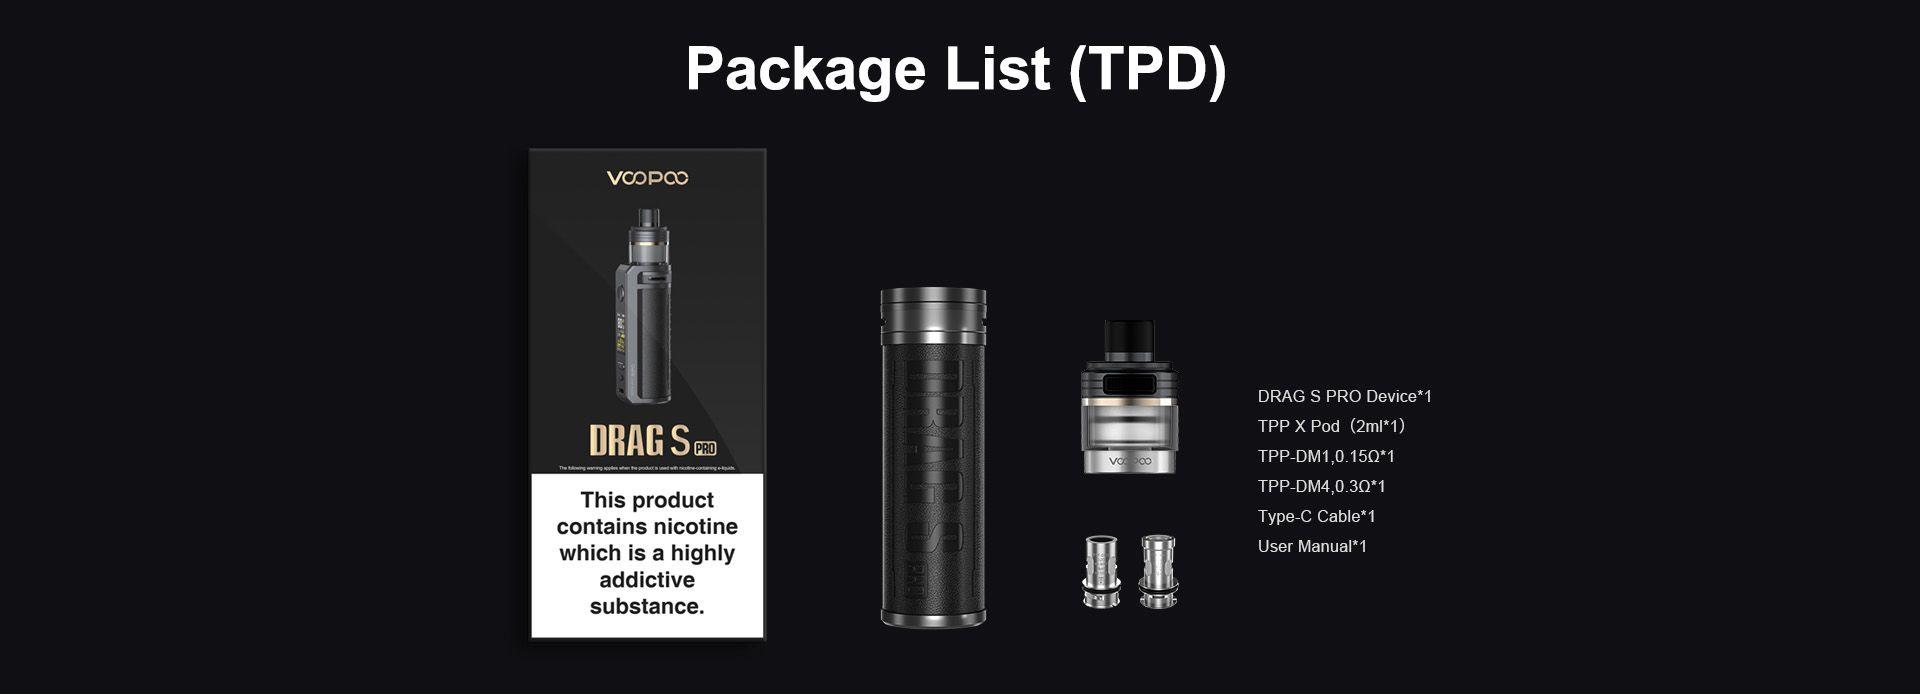 Voopoo Drag S Pro Box Contents